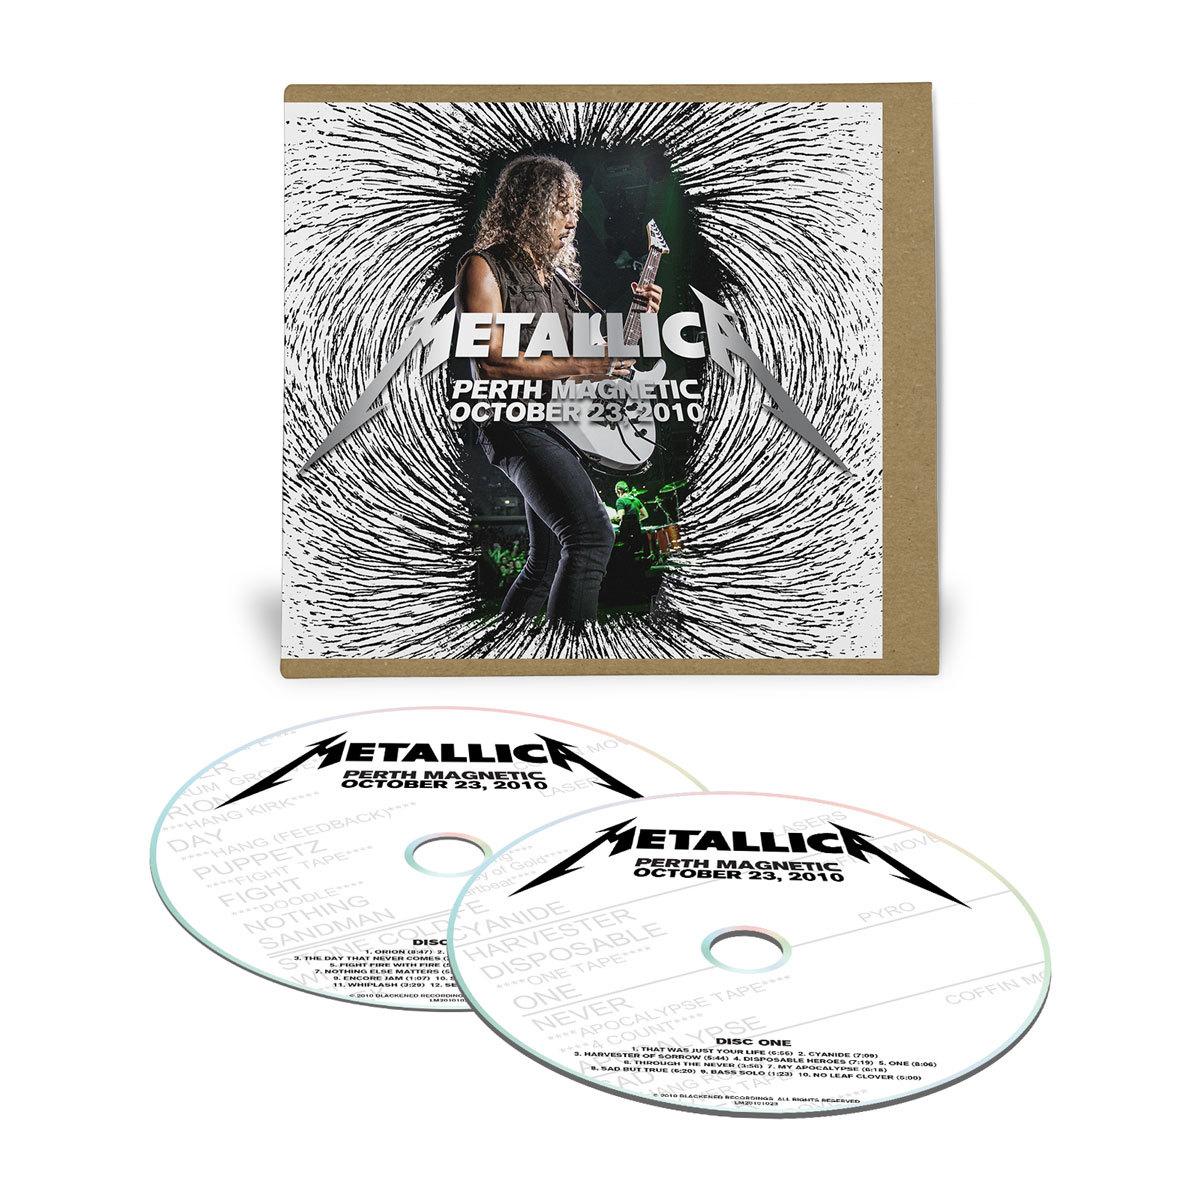 Live Metallica: Perth, Australia - October 23, 2010 (2CD ...